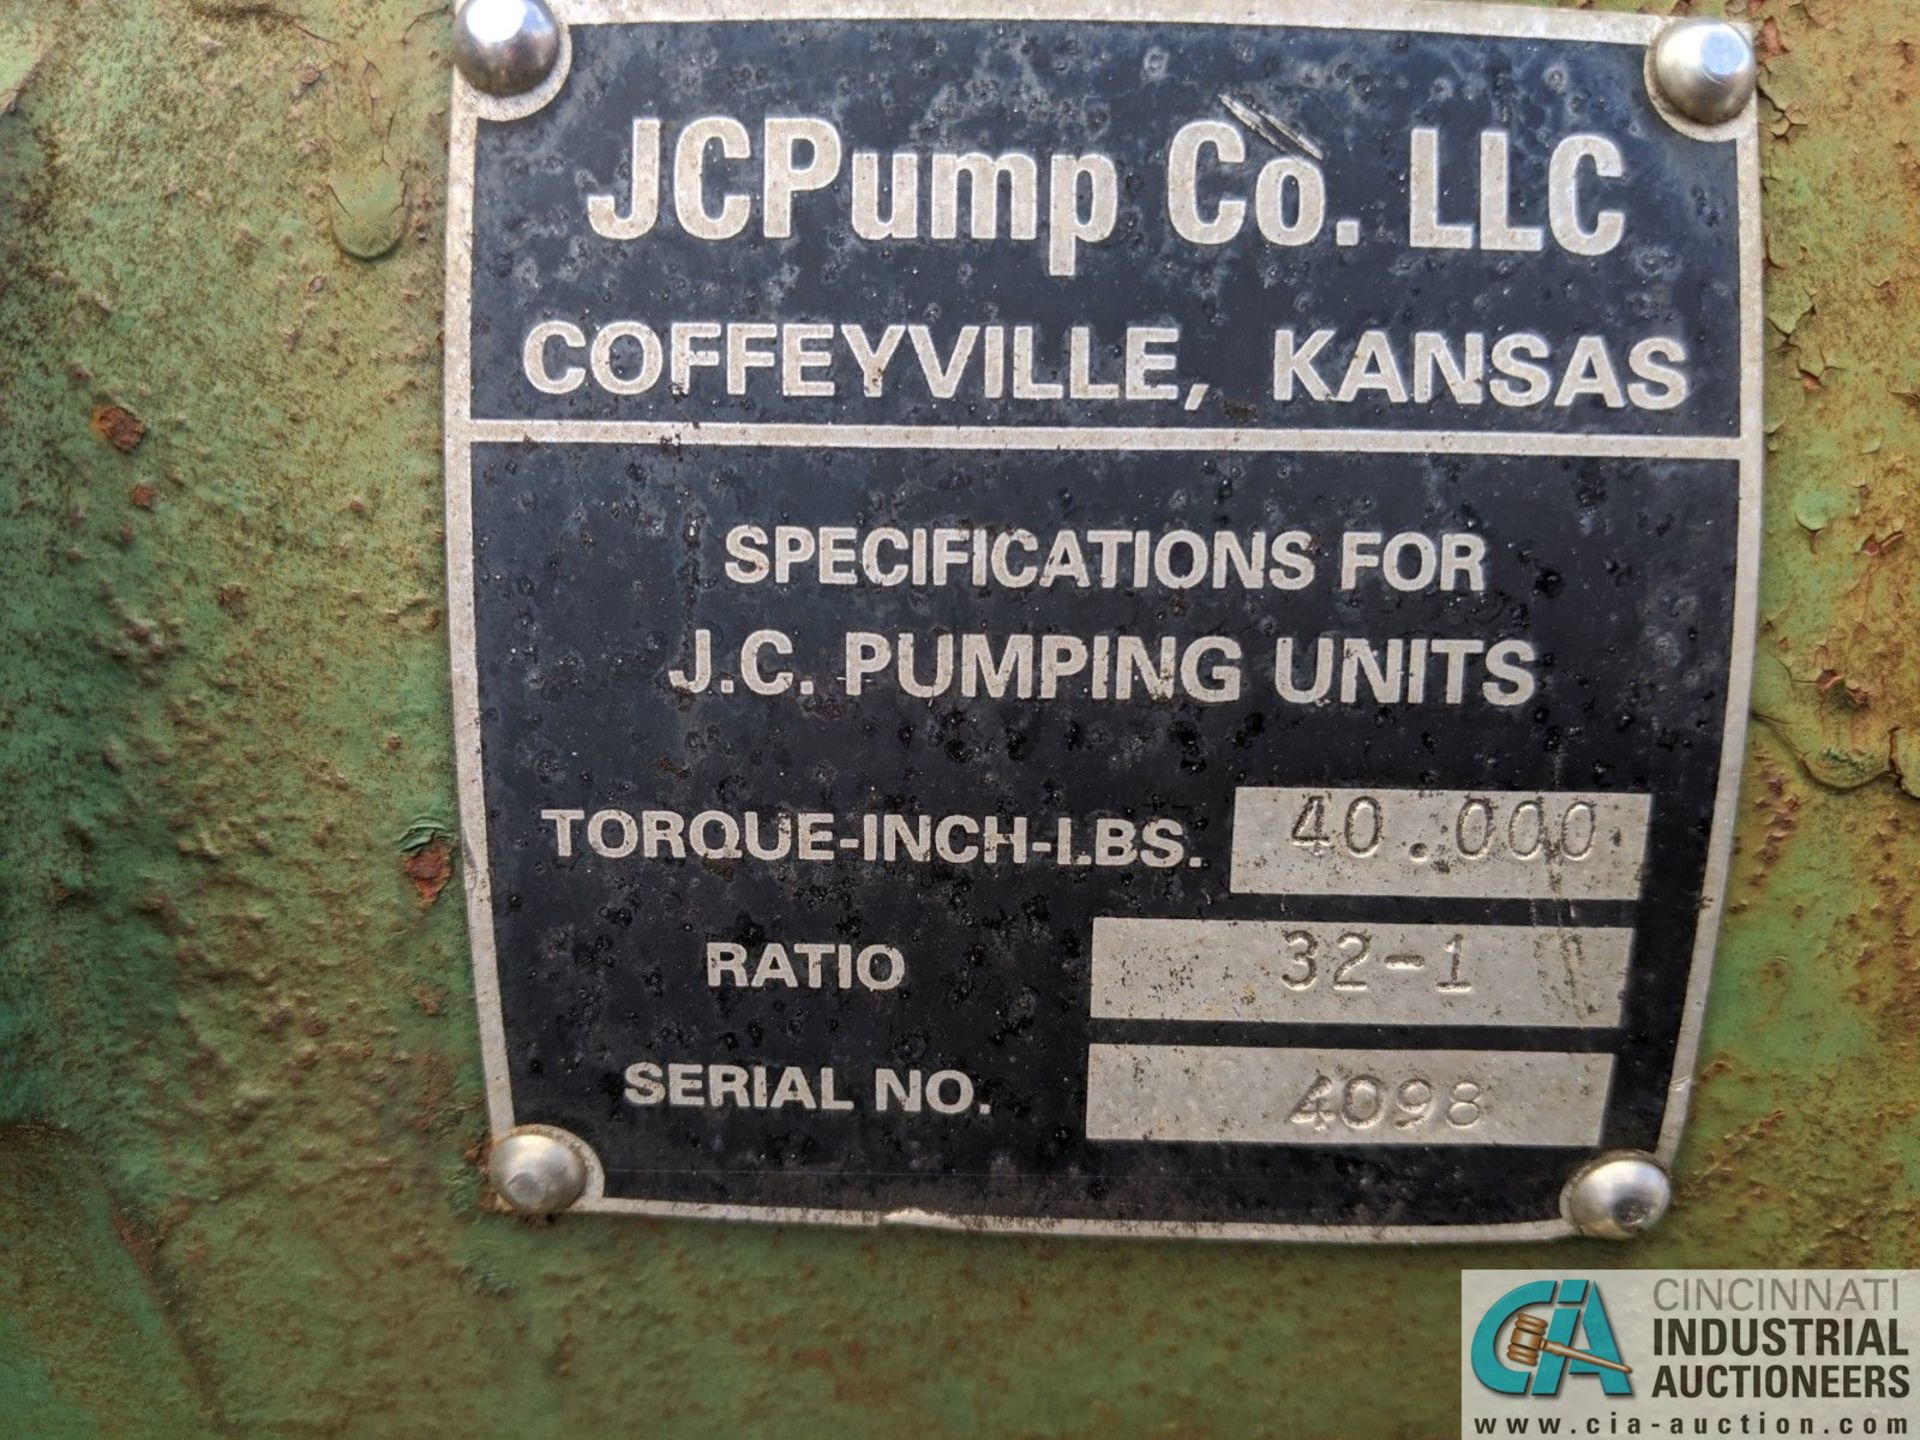 JC PUMP INC. PUMP JACK (8635 East Ave., Mentor, OH 44060 - John Magnasum: 440-667-9414) - Image 4 of 5